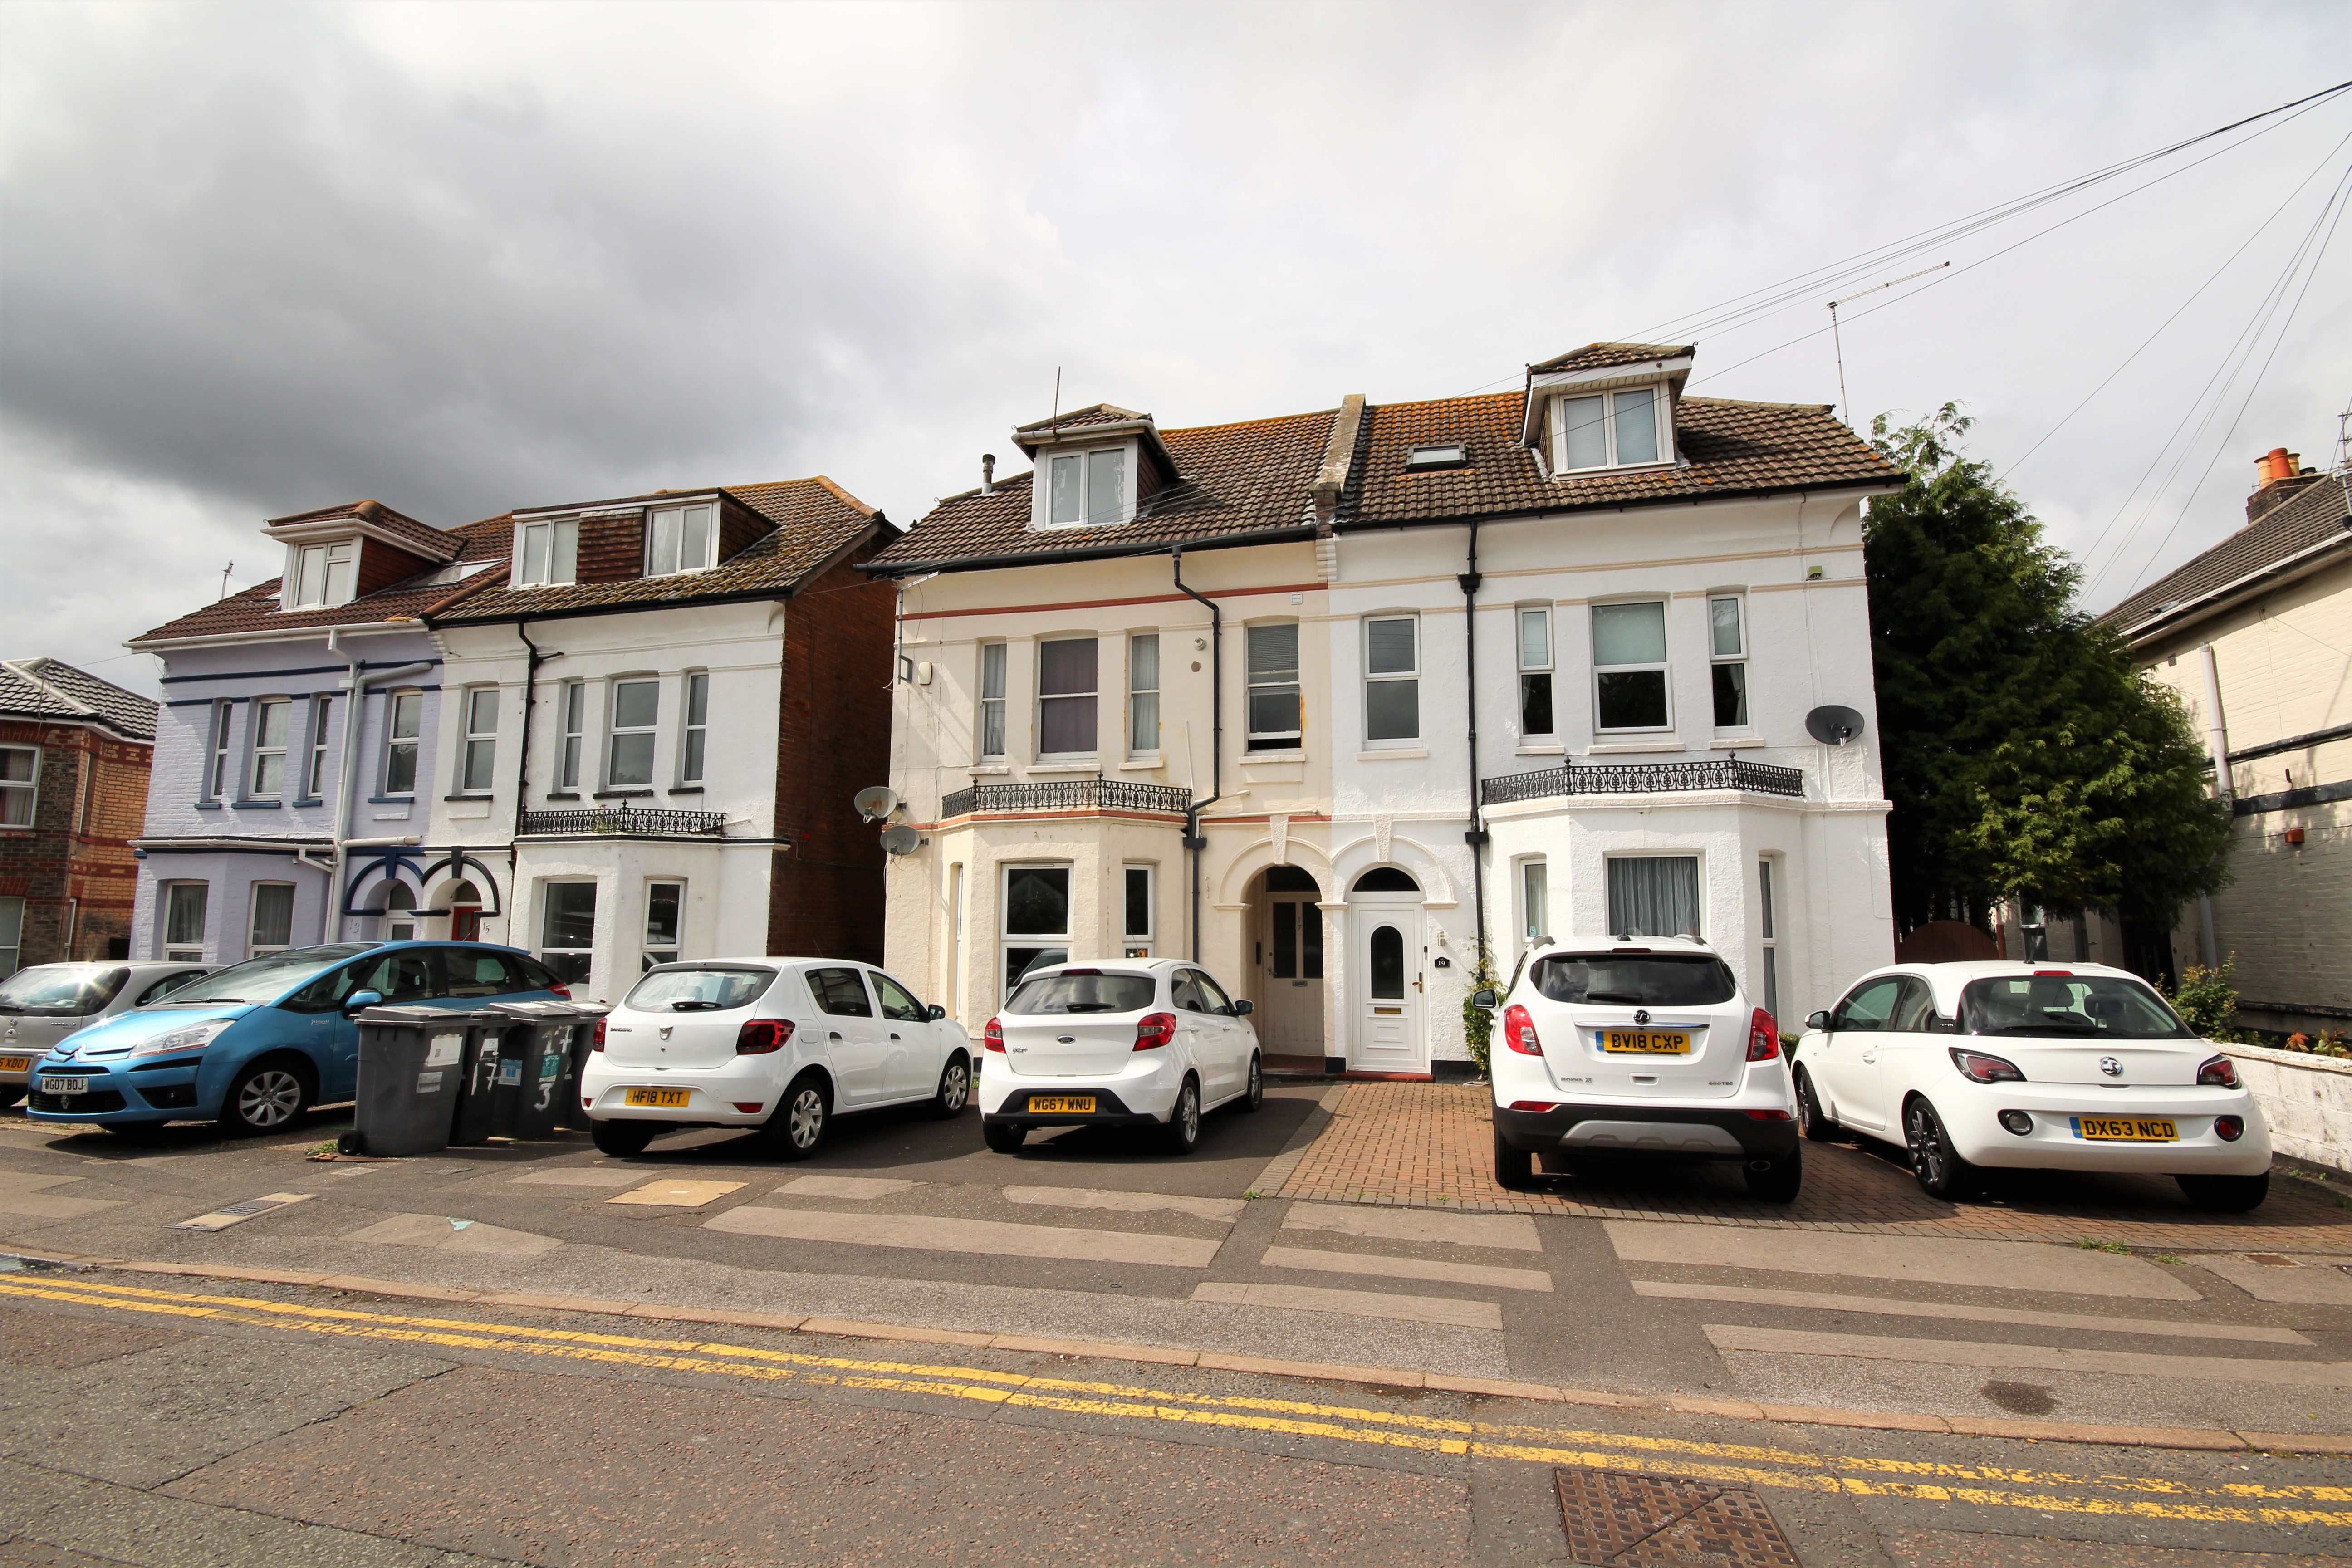 Bournemouth, Dorset, BH1